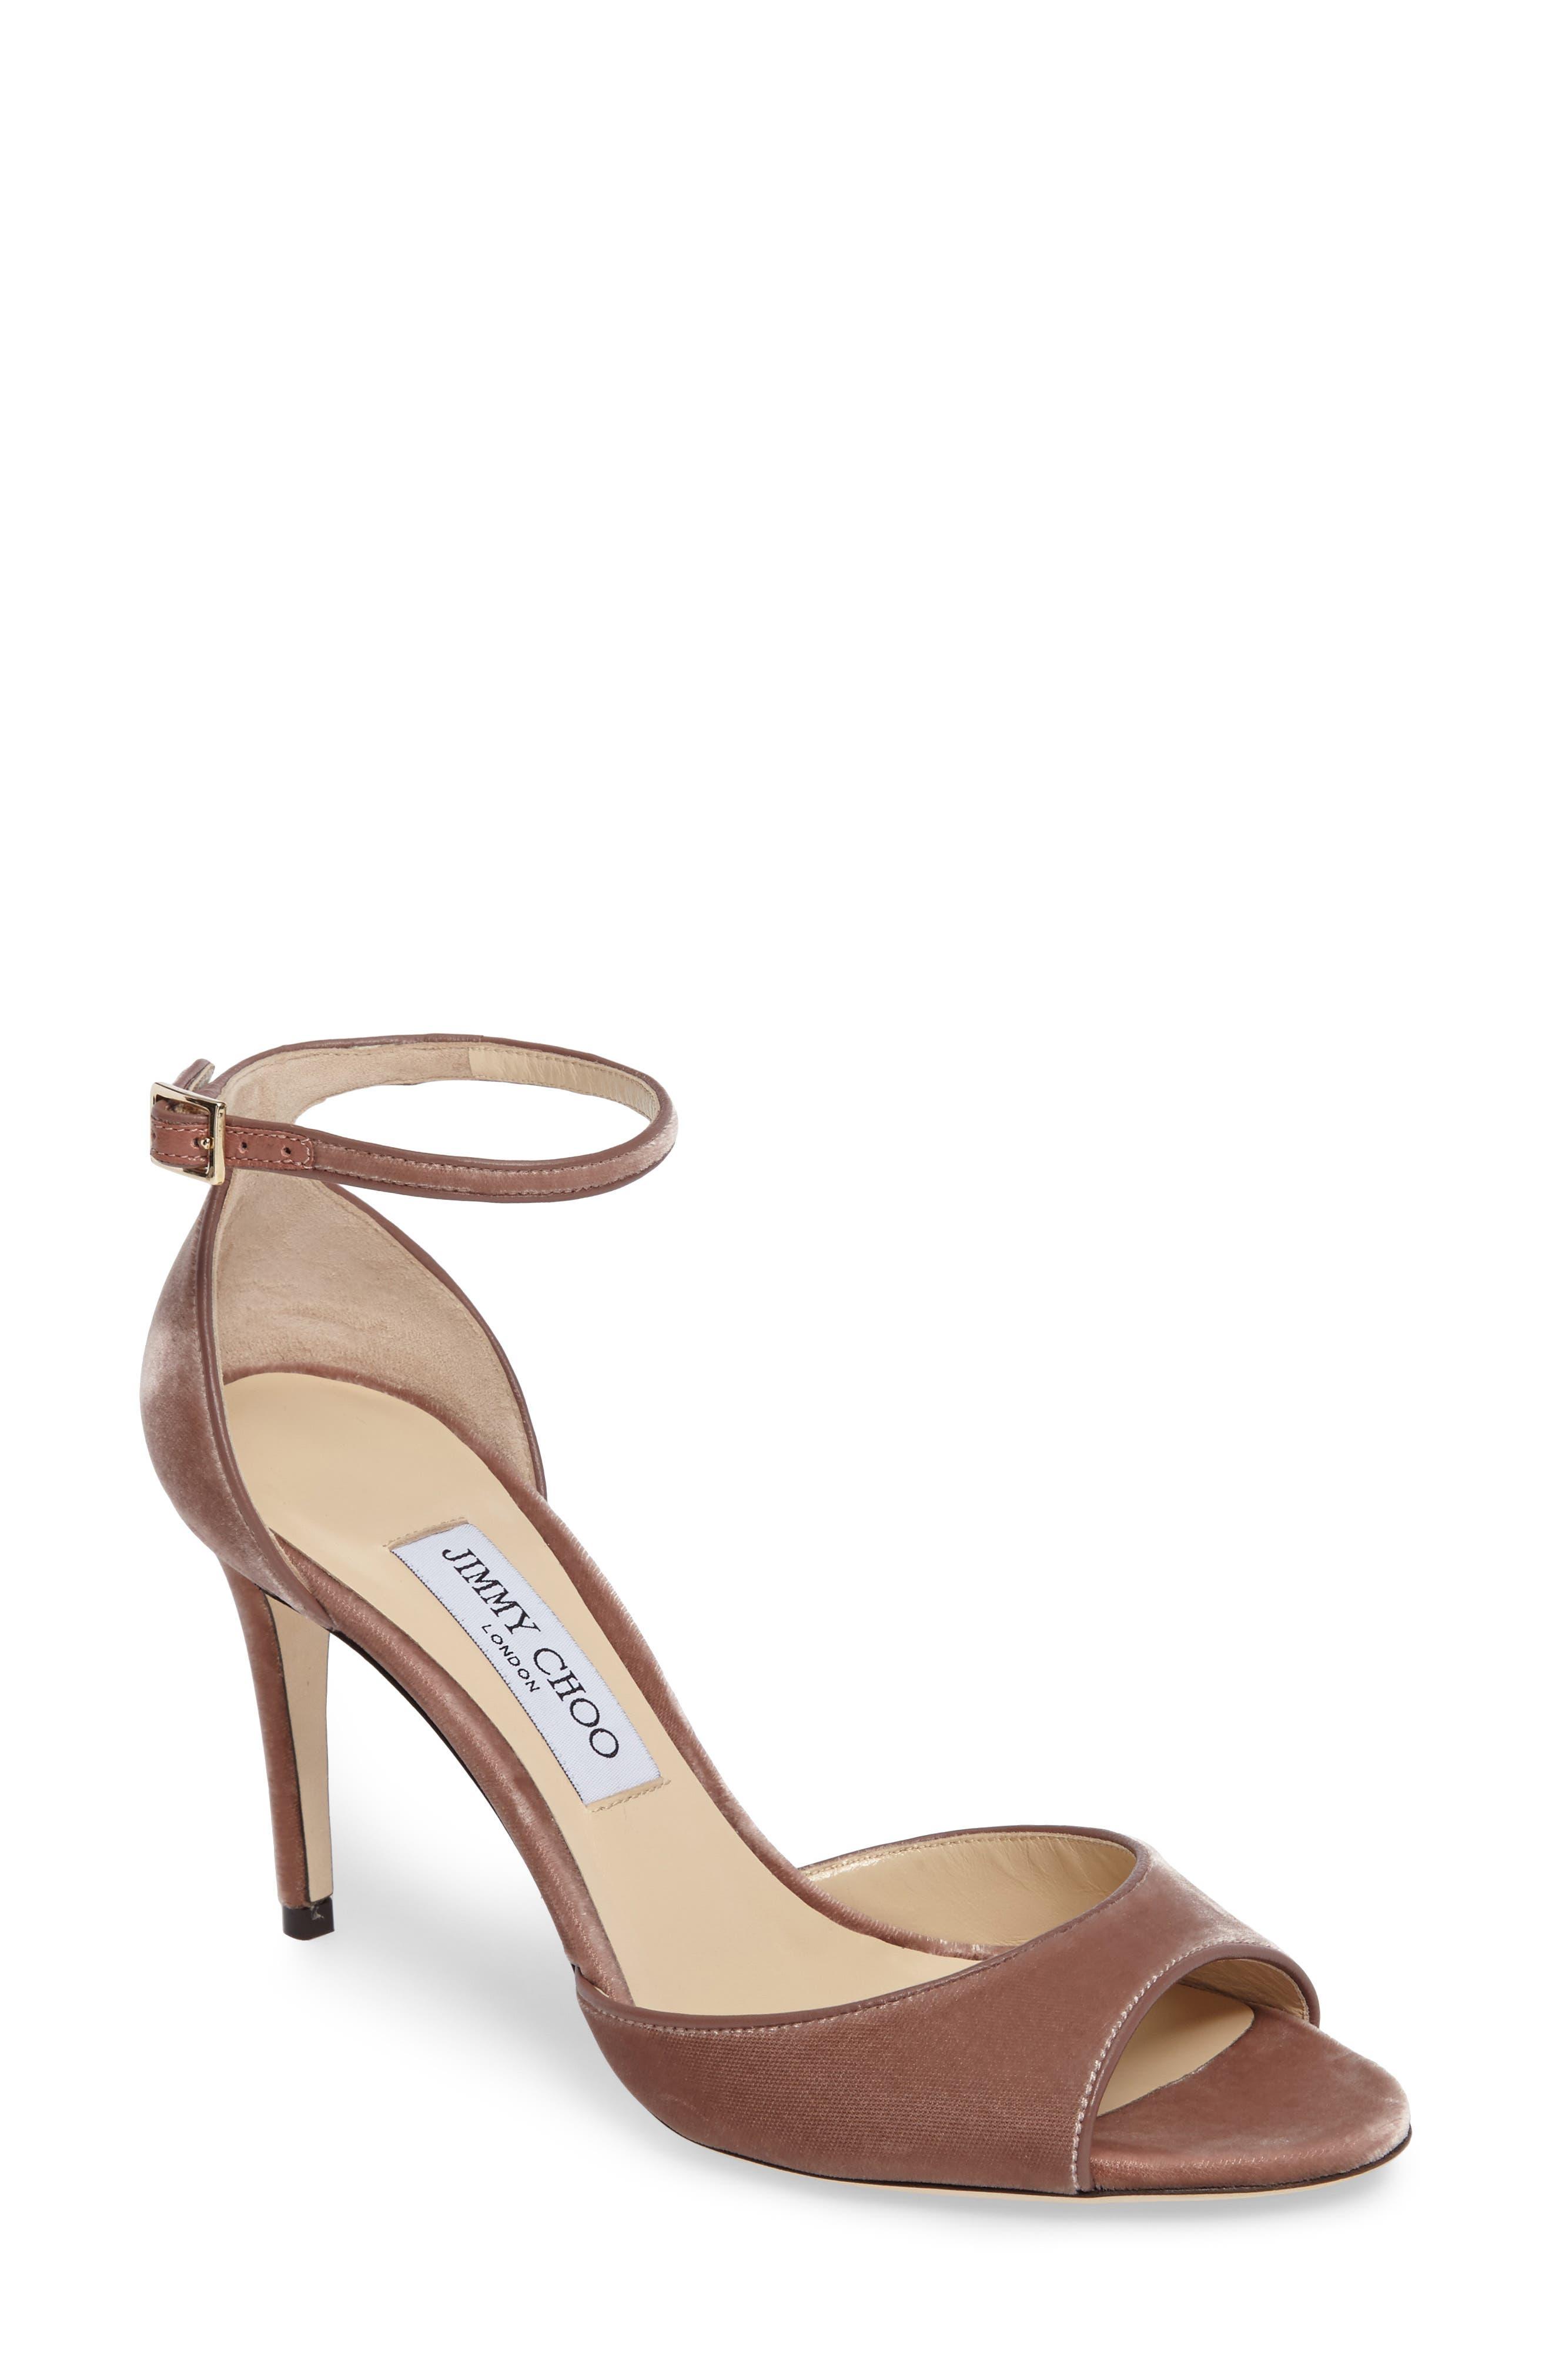 Alternate Image 1 Selected - Jimmy Choo Annie Ankle Strap Sandal (Women)